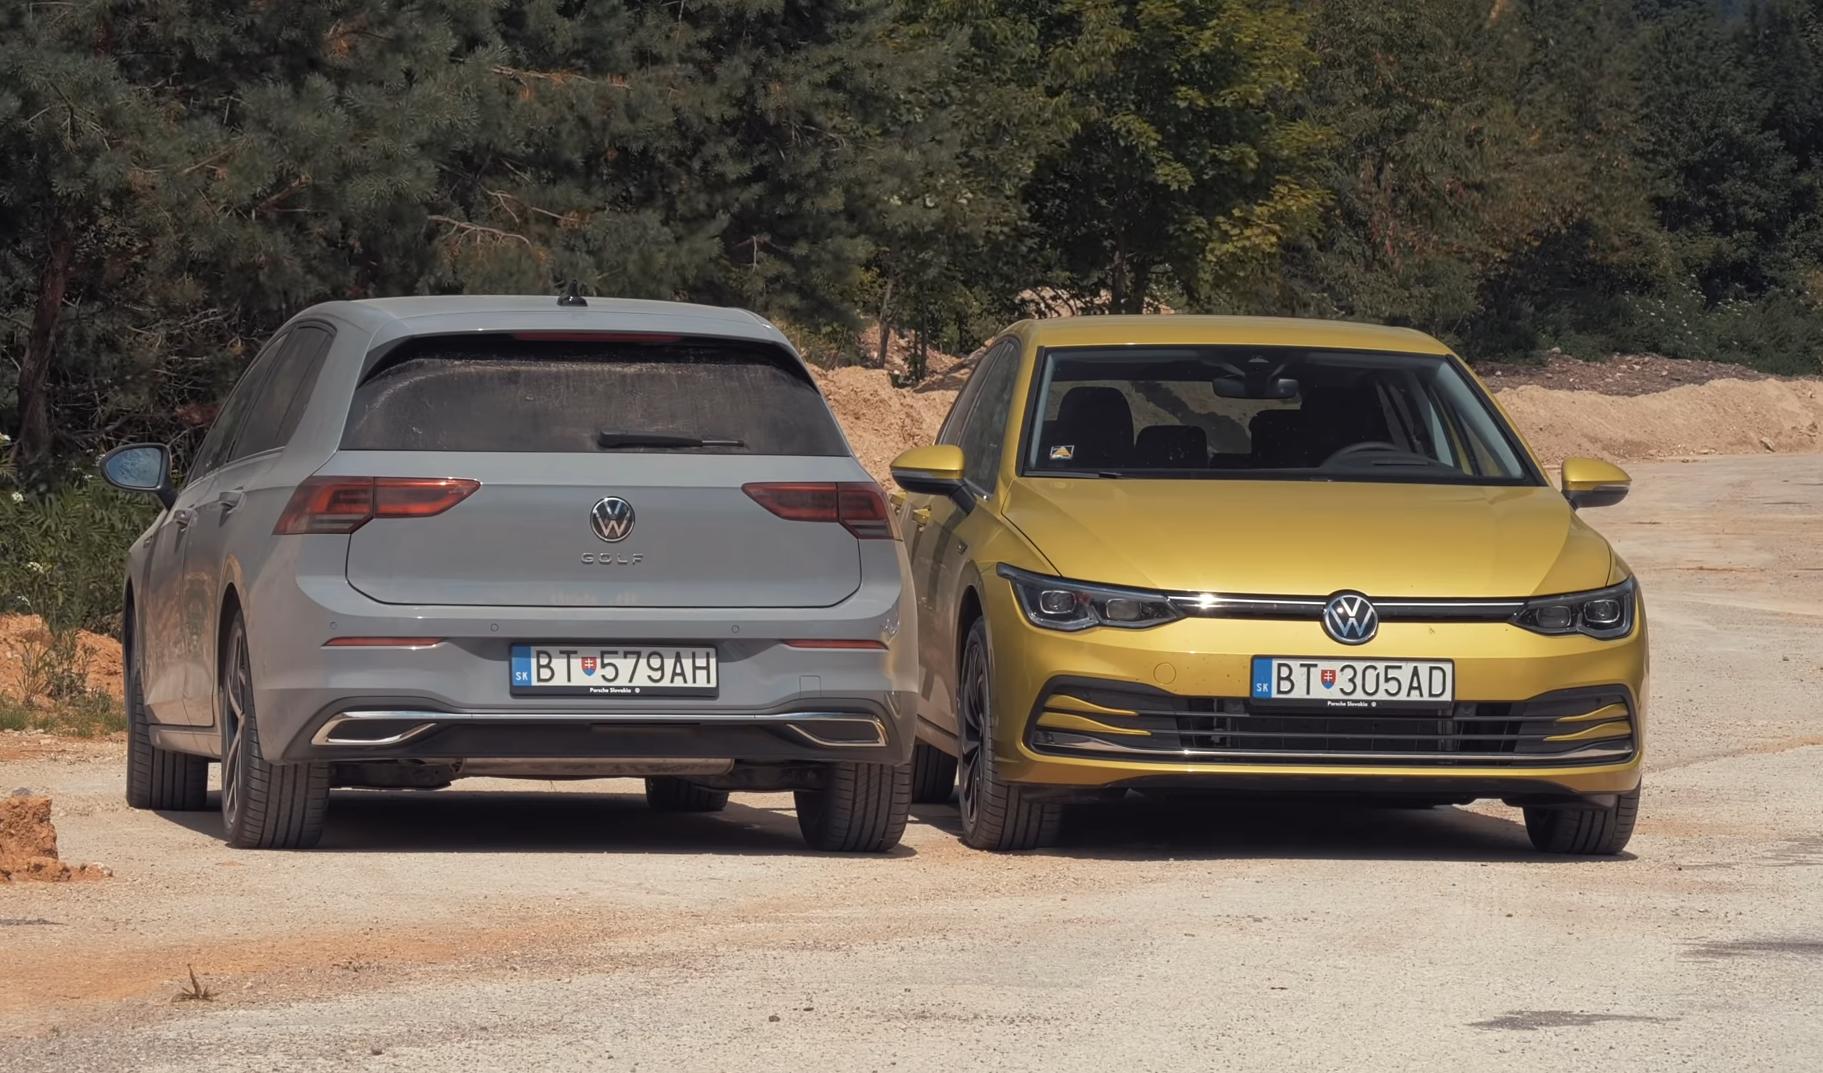 Test Volkswagen Golf: Vyskúšali sme manuál aj automat